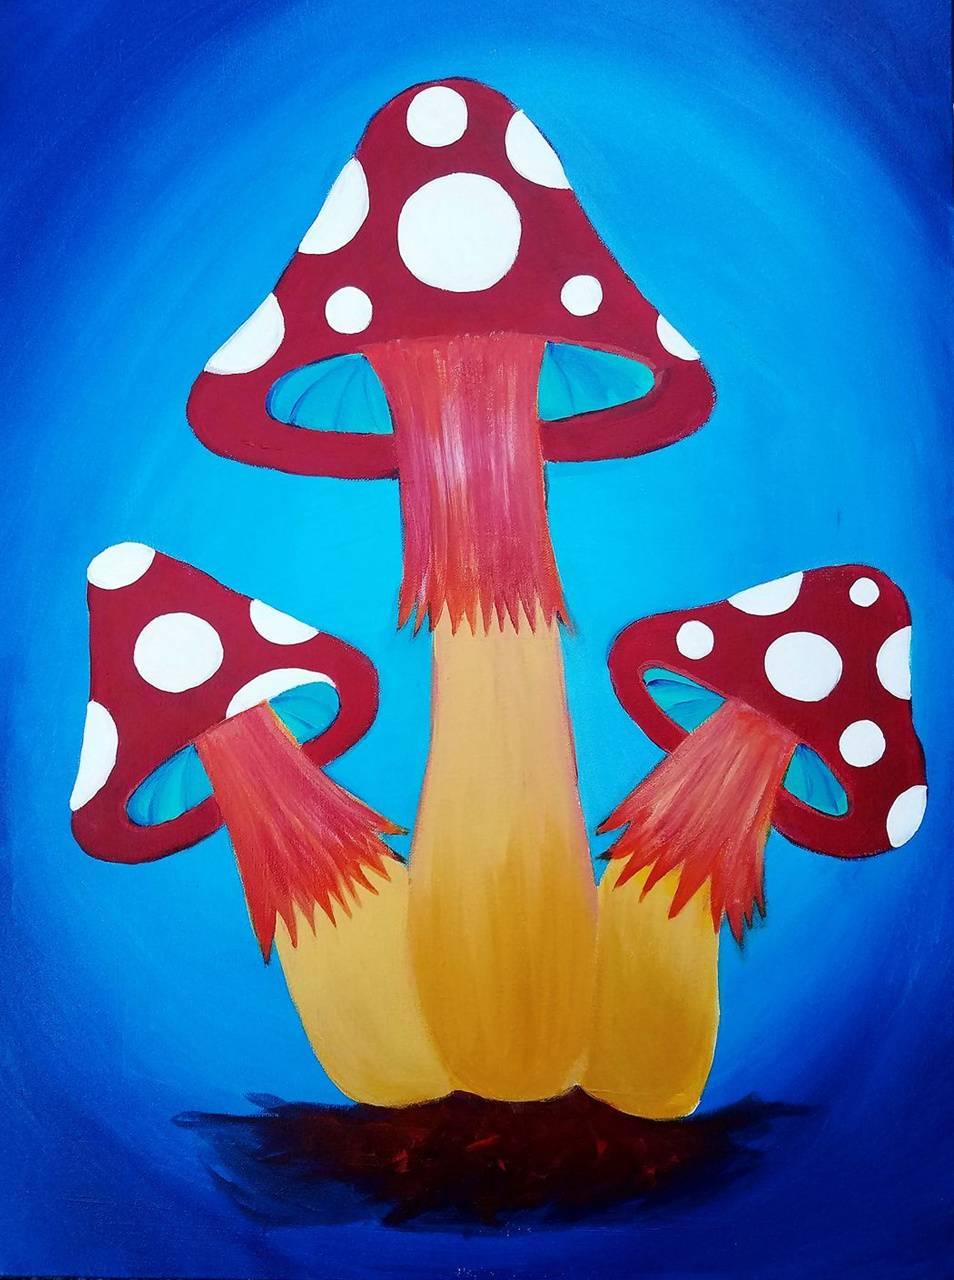 Mario Mushroom Art Wallpaper By Artbymeganbrock 30 Free On Zedge